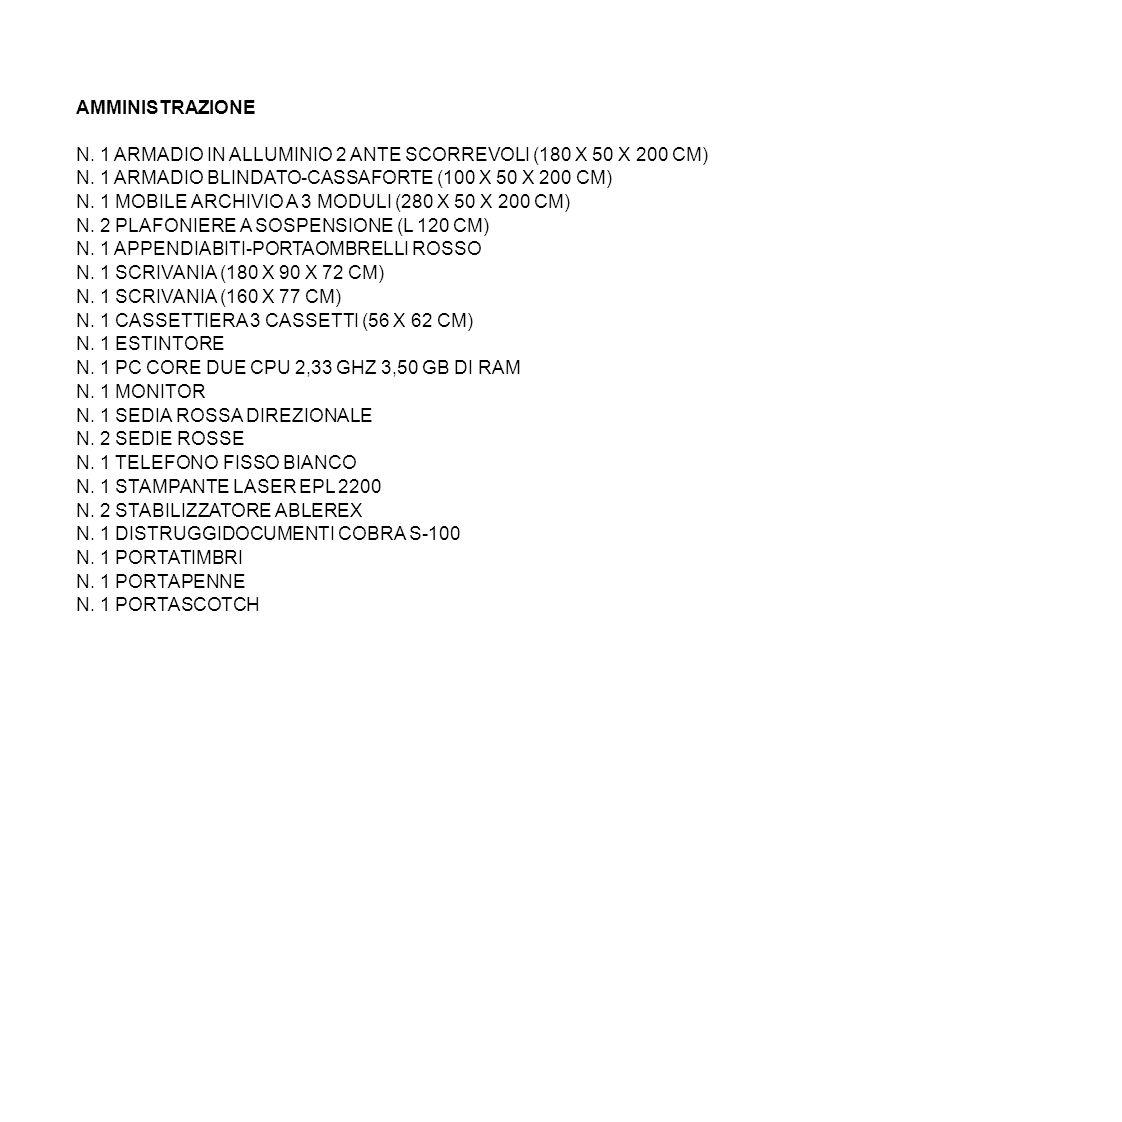 AMMINISTRAZIONE N. 1 ARMADIO IN ALLUMINIO 2 ANTE SCORREVOLI (180 X 50 X 200 CM) N. 1 ARMADIO BLINDATO-CASSAFORTE (100 X 50 X 200 CM)